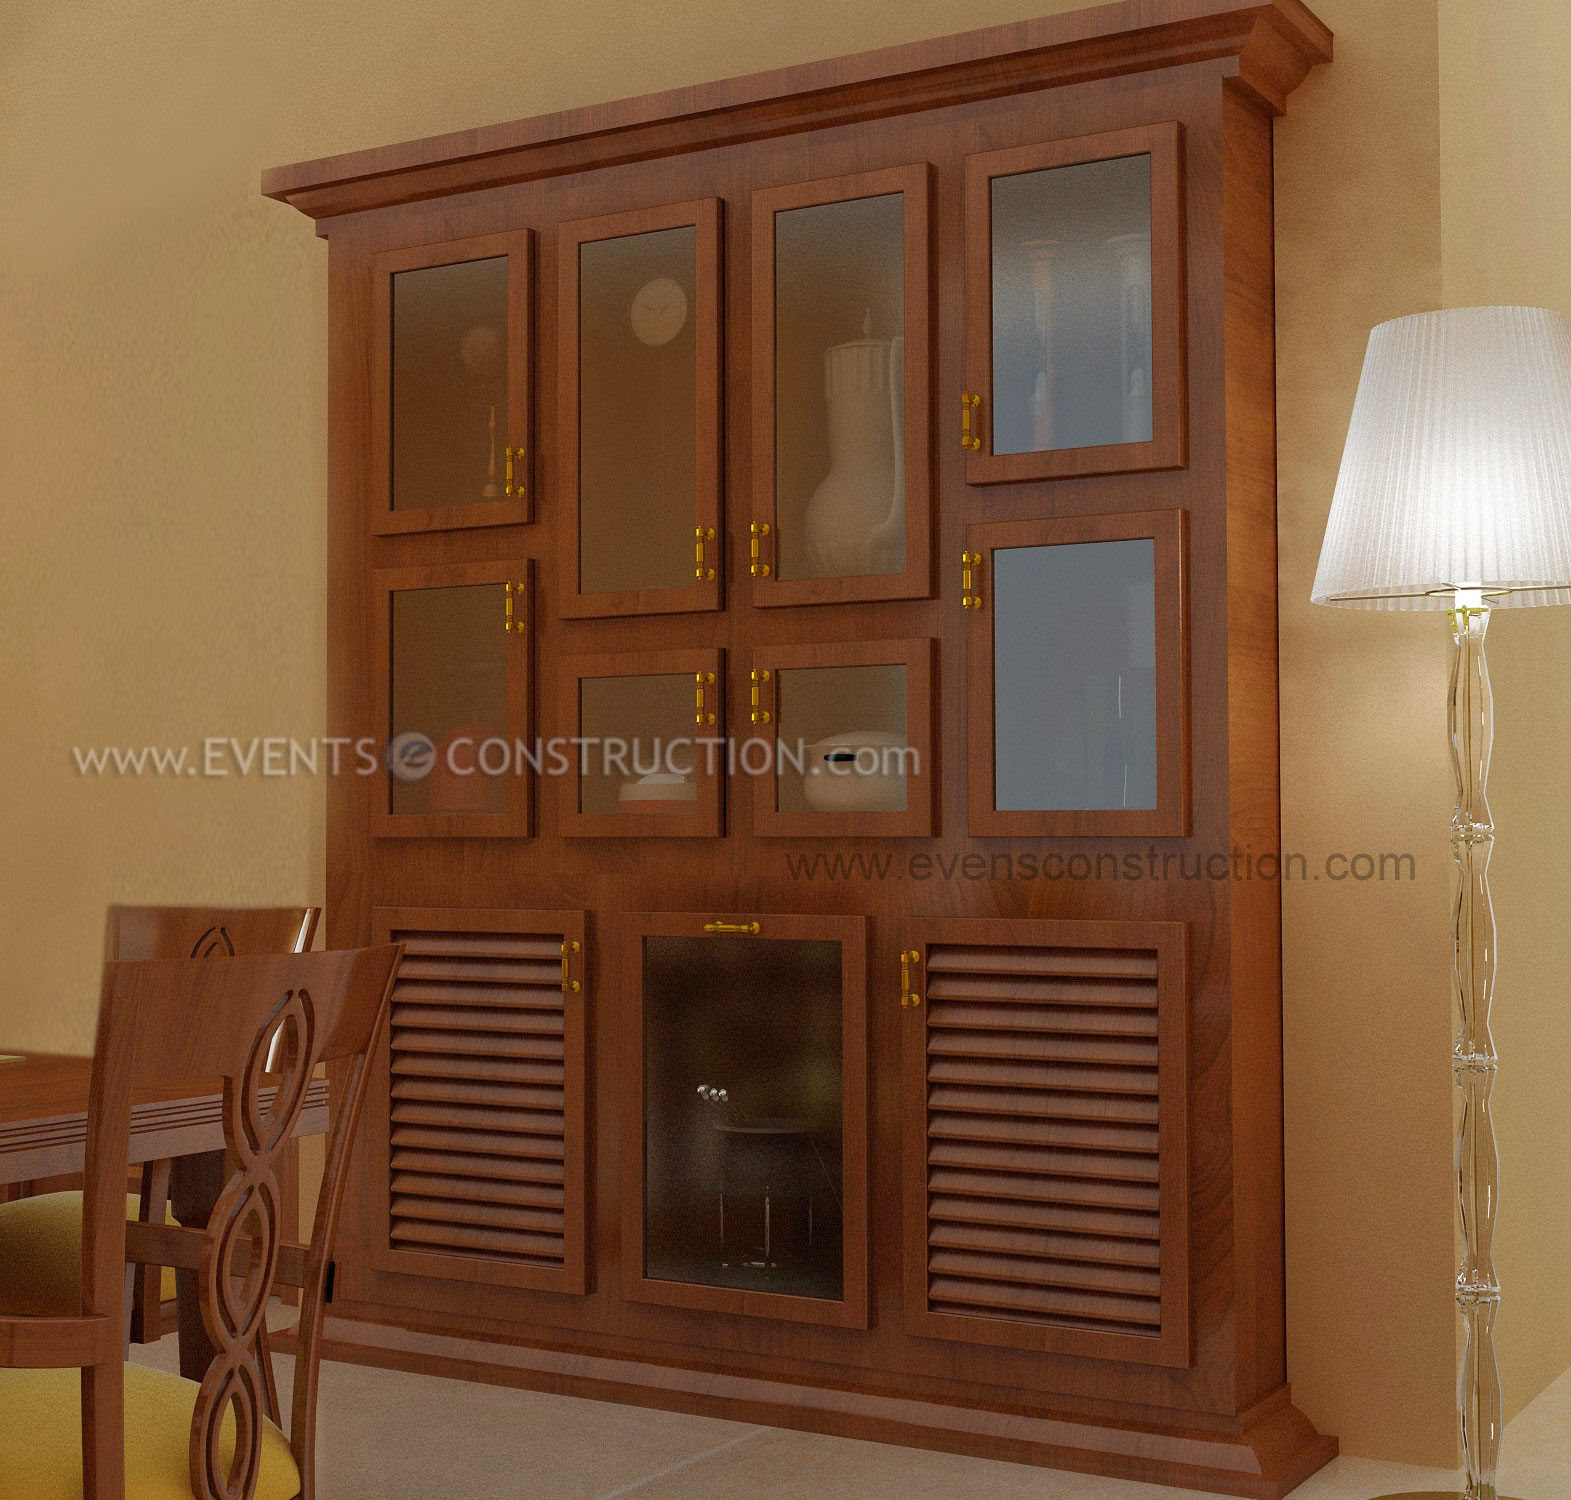 Shelves In Dining Room: Evens Construction Pvt Ltd: Crockery Shelf Designed For